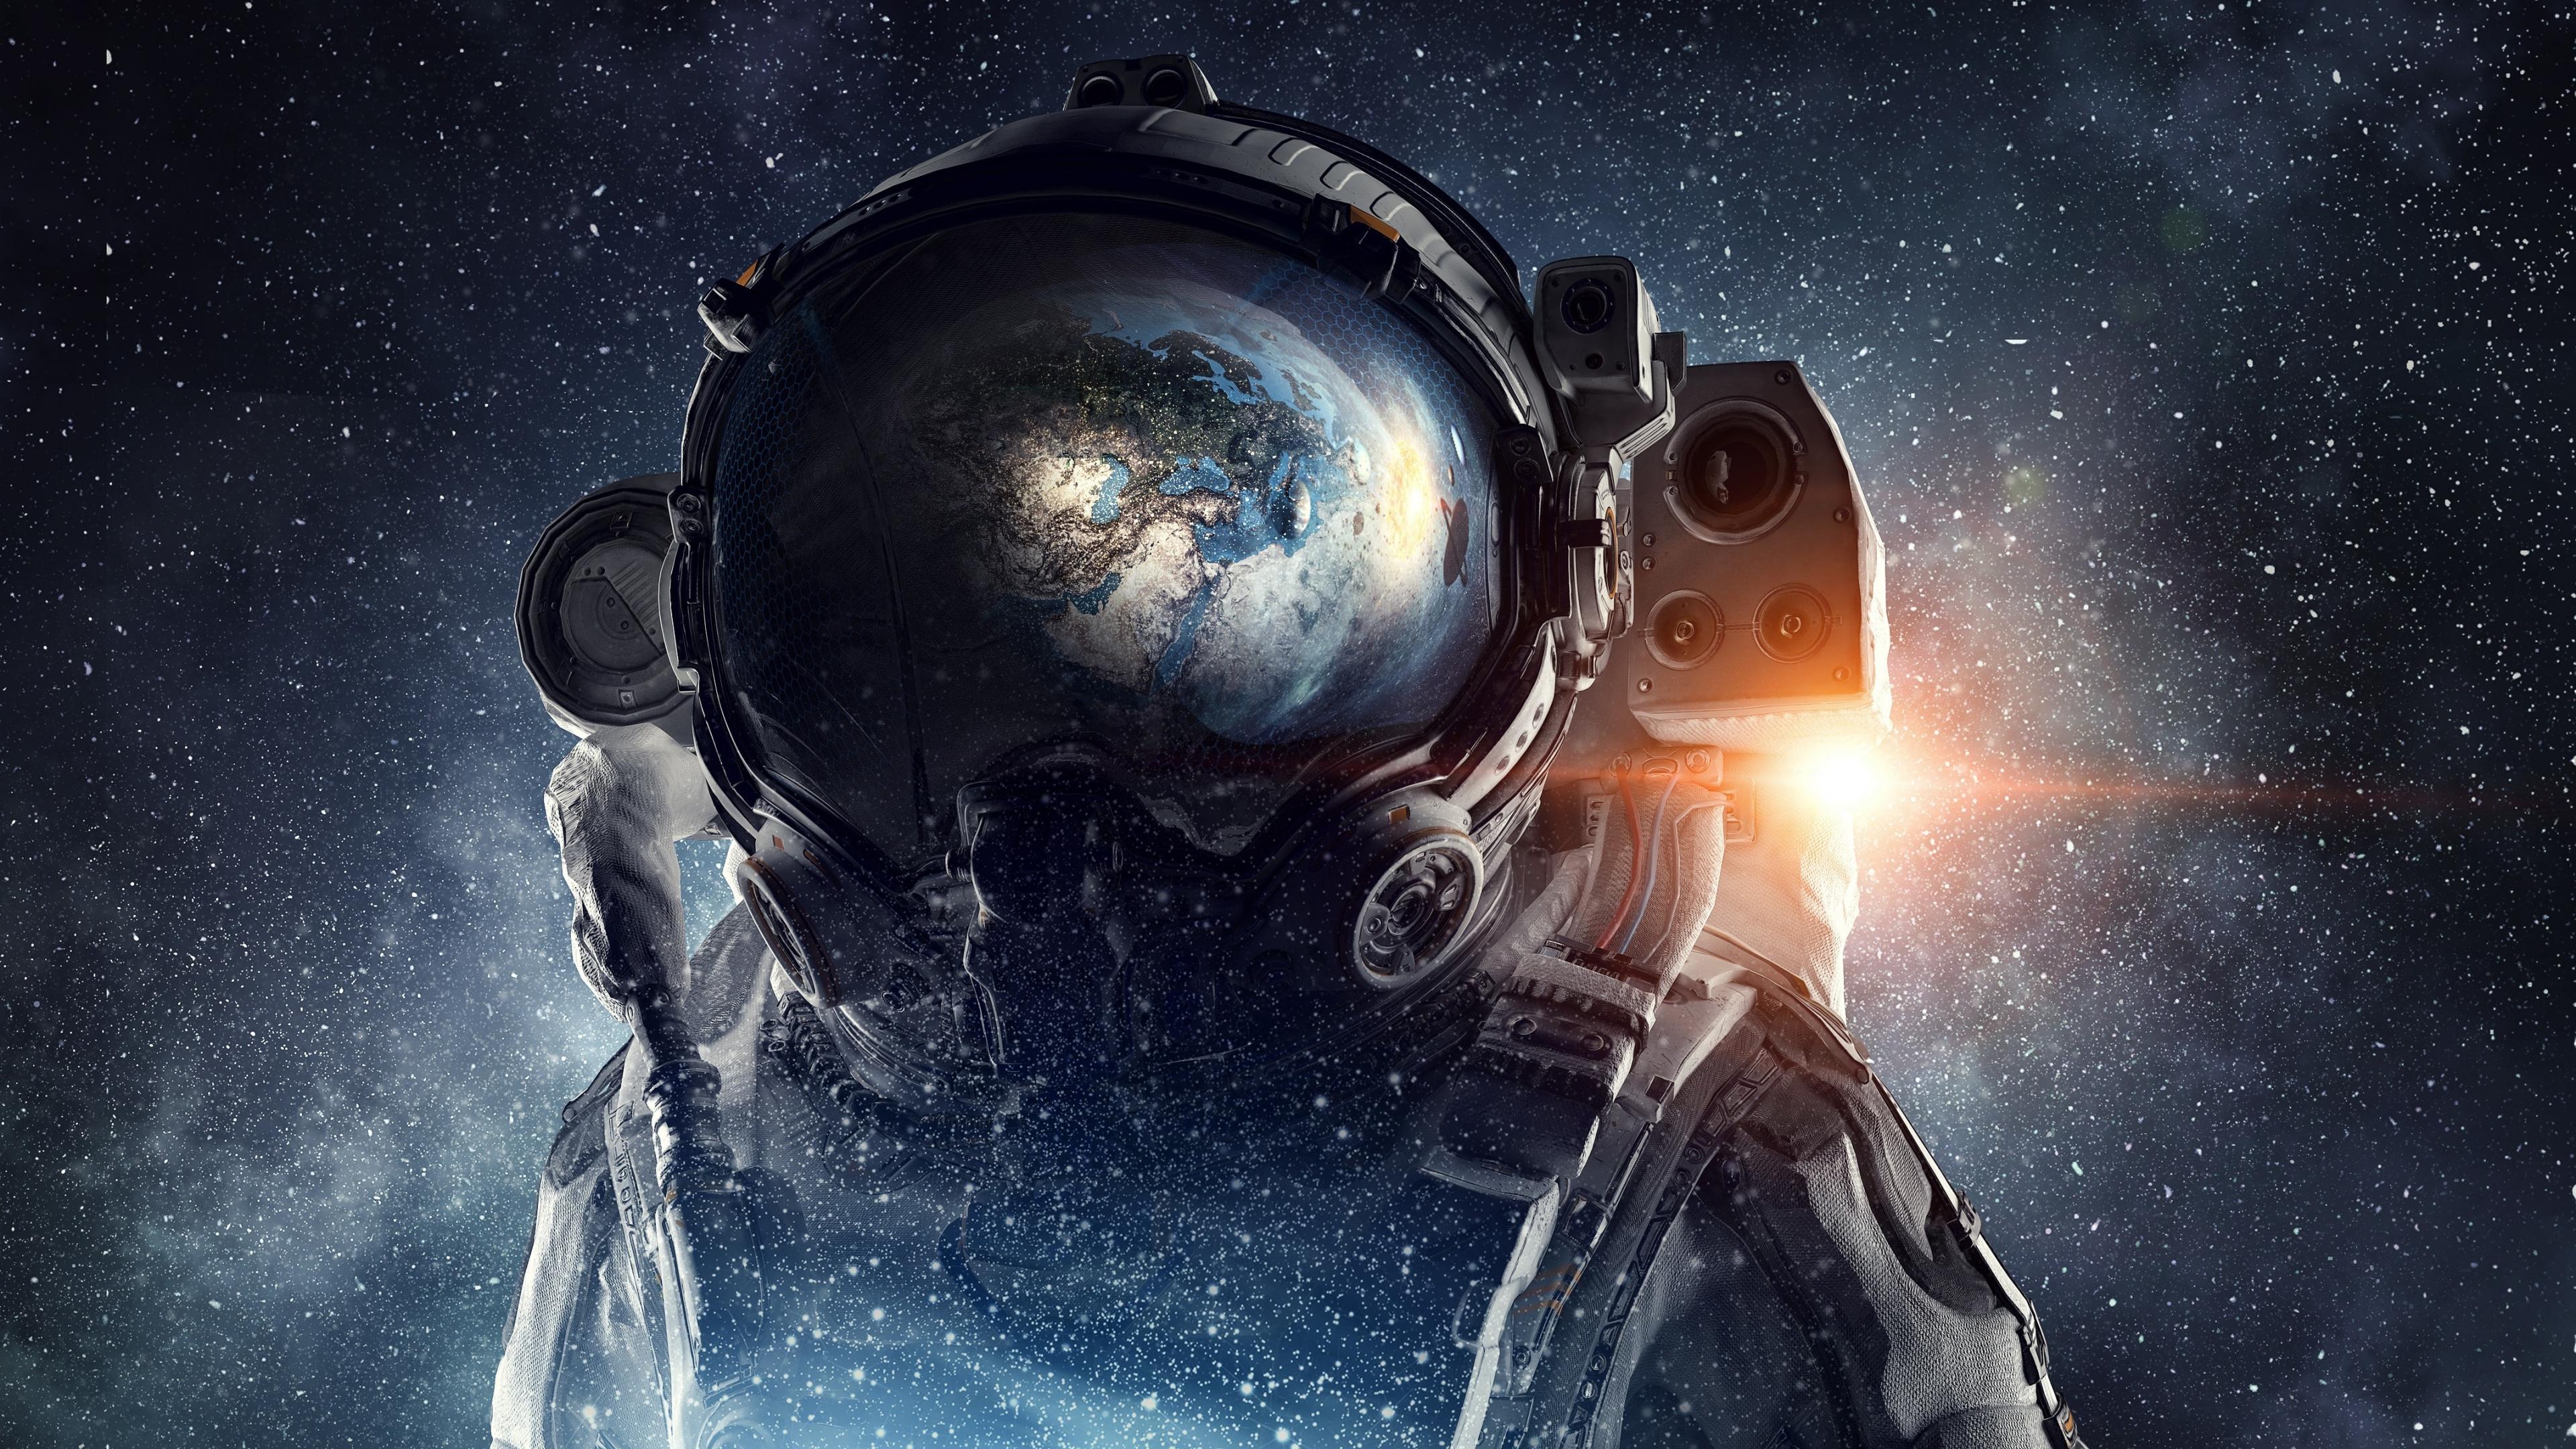 Download 3840x2160 Wallpaper Fantasy Astronaut Space 4k